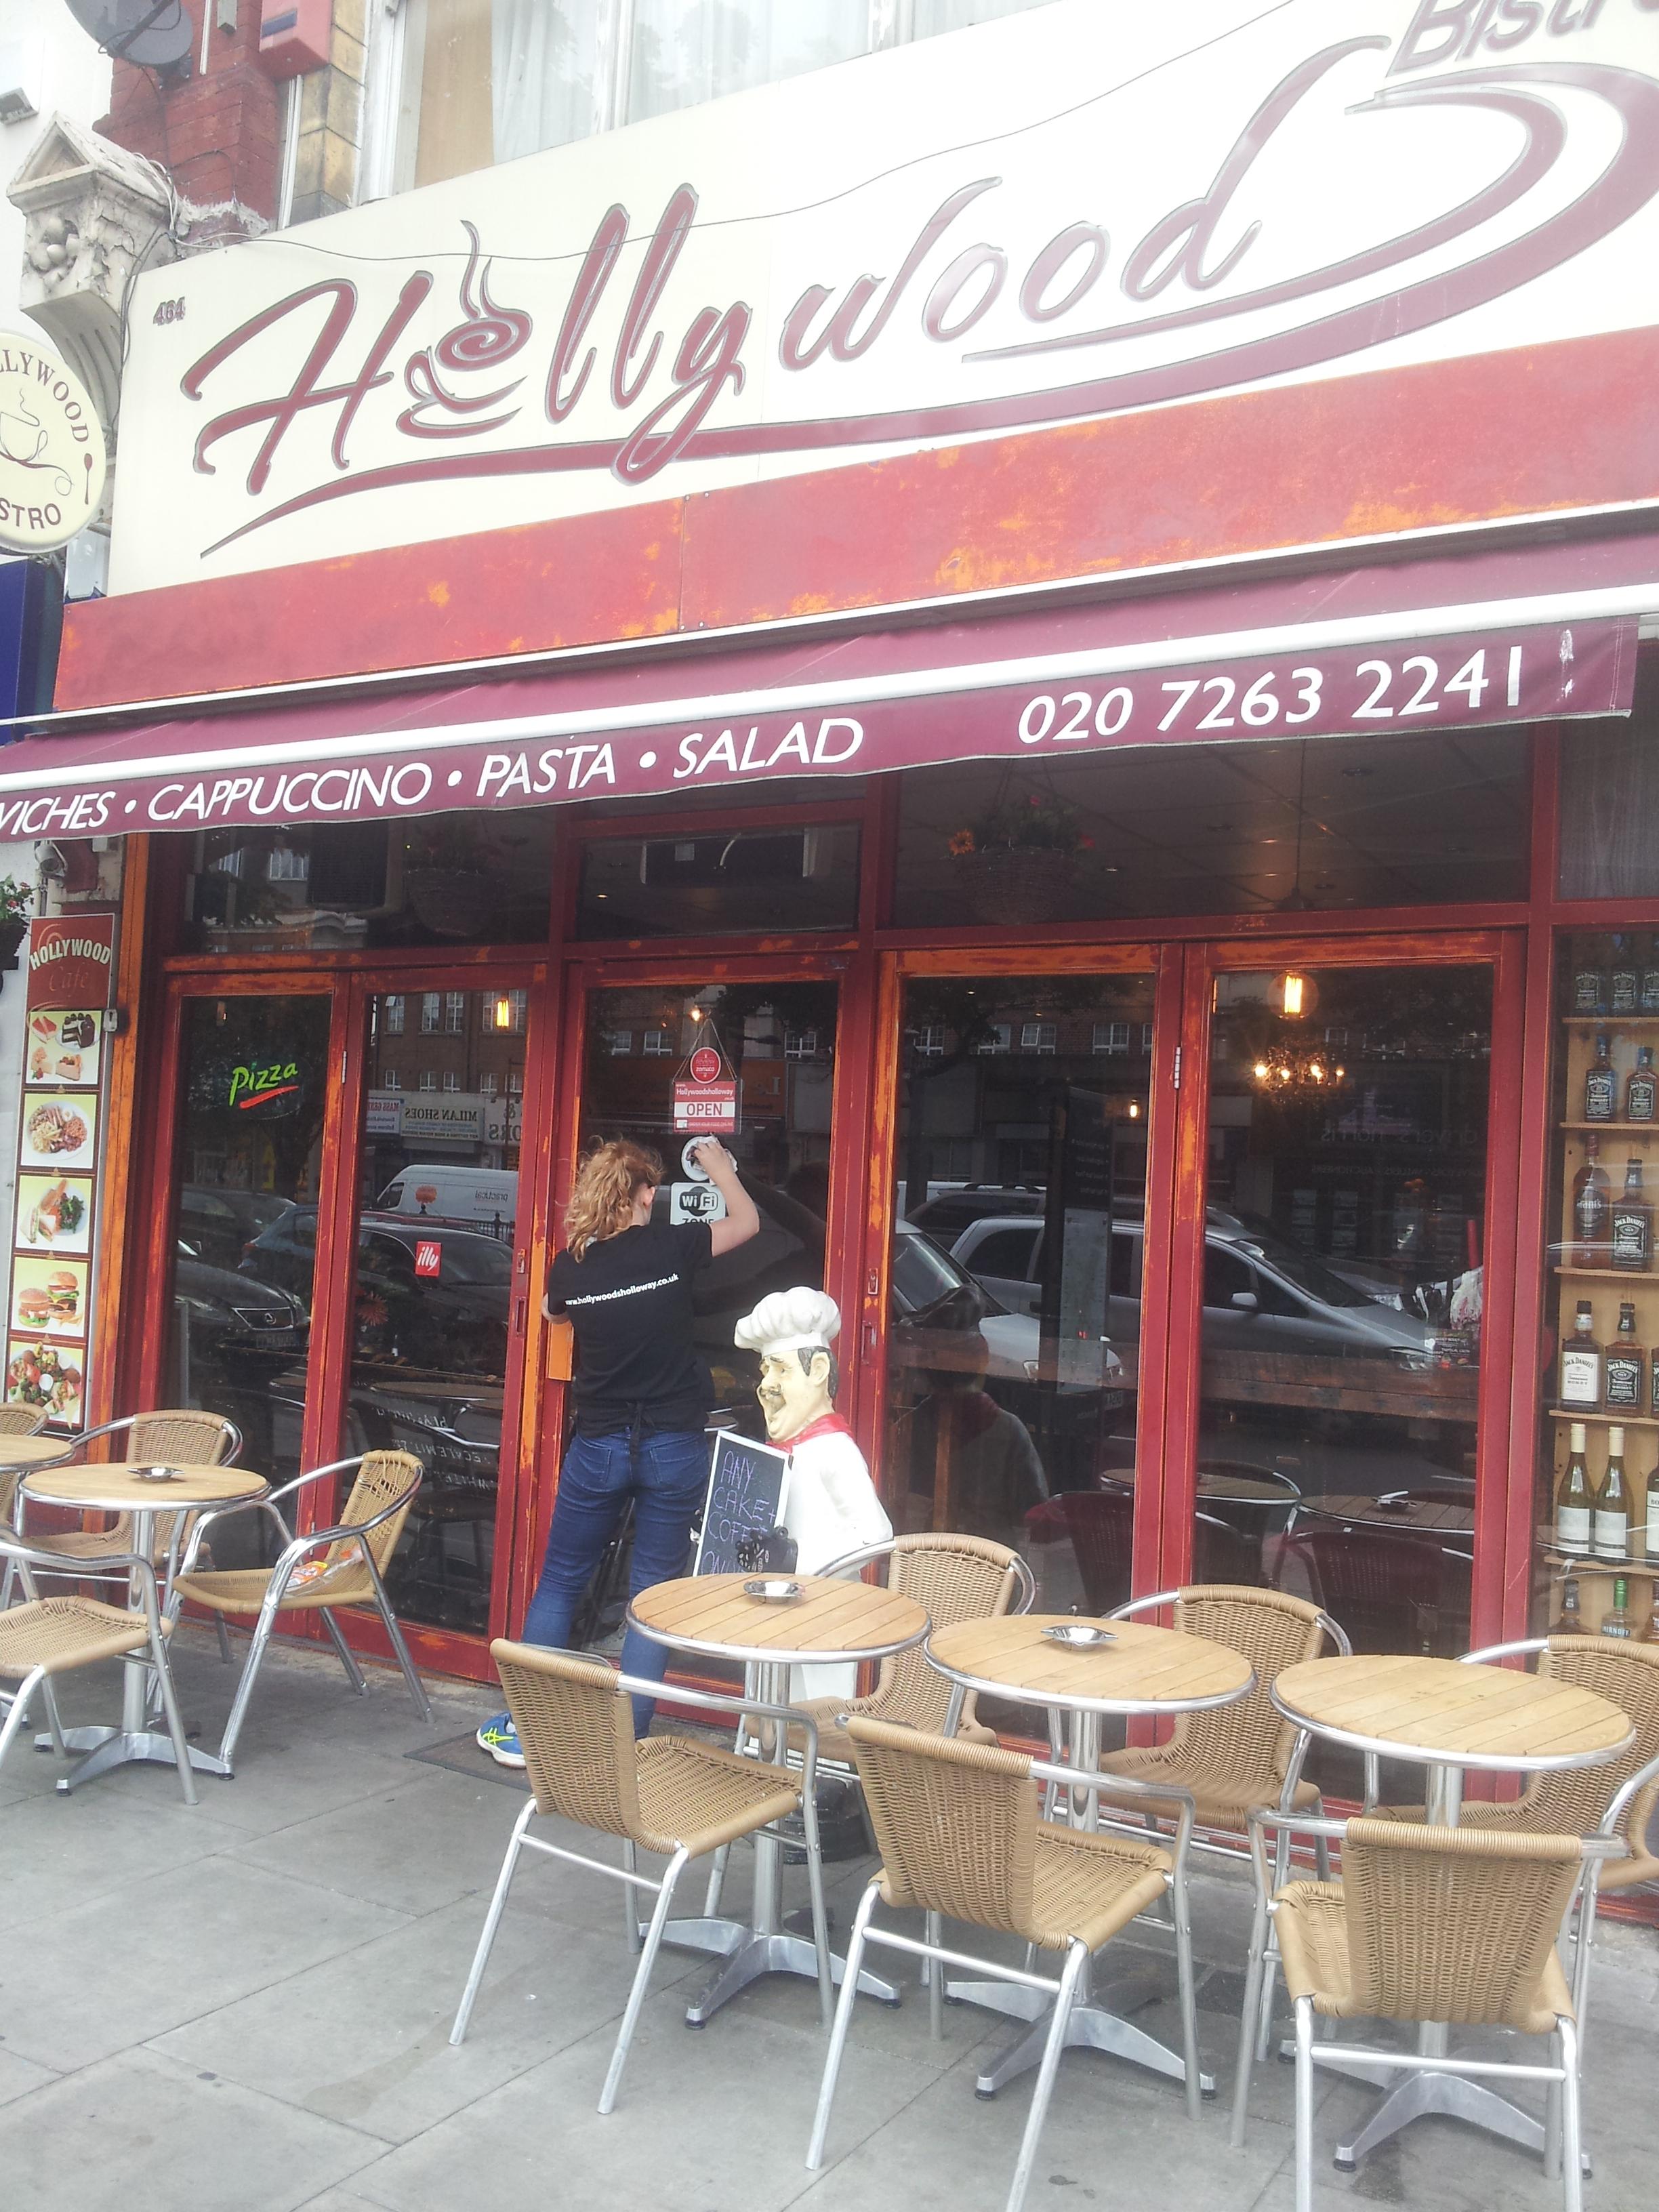 holloway road | Islington Faces Blog